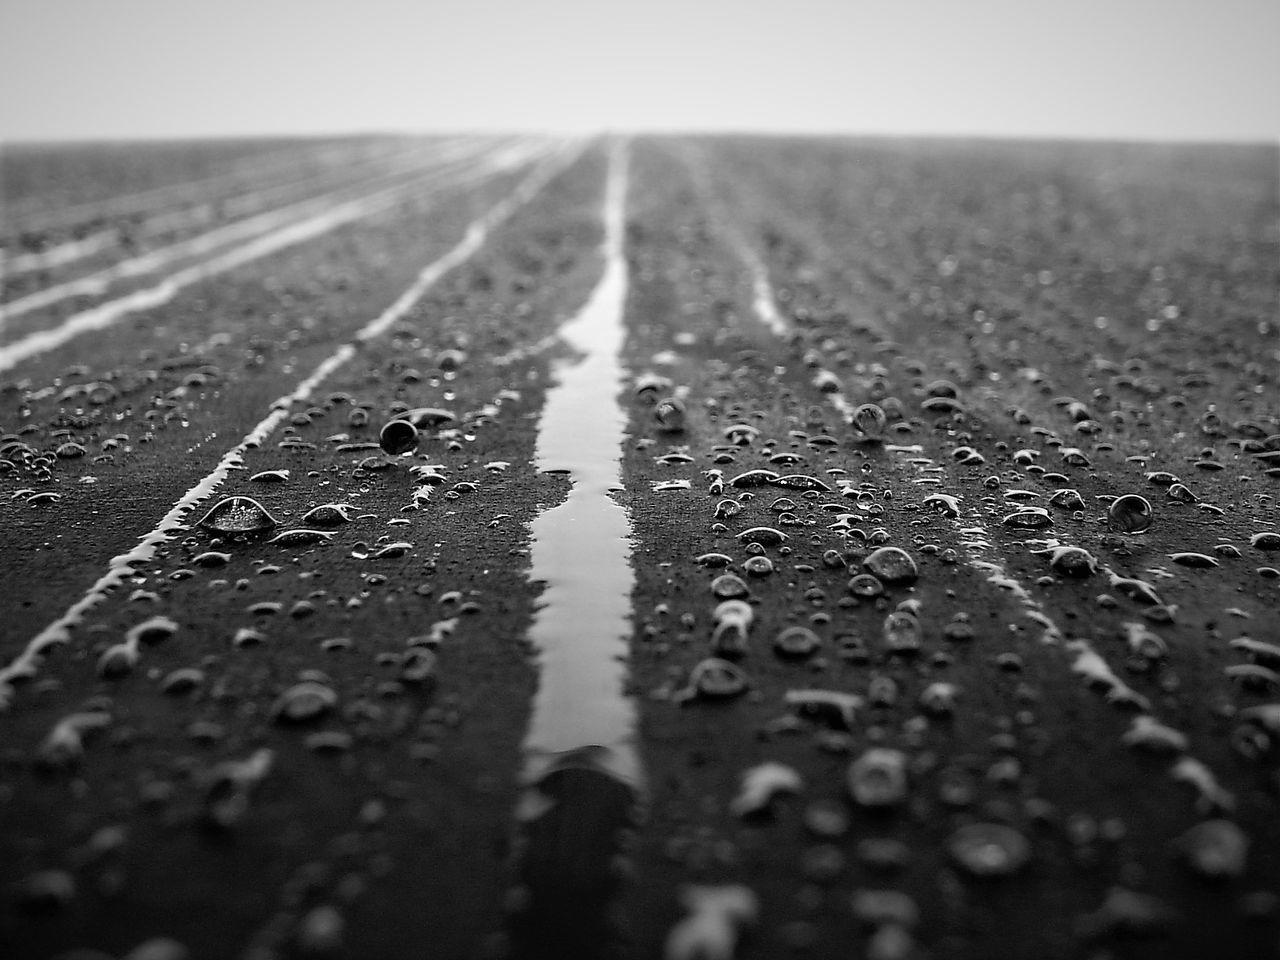 Black And White Capture Berlin Day Drops Drops Of Rain Holocaust Mahnmal Holocaust Memorial No People Outdoors Rain Sky Water